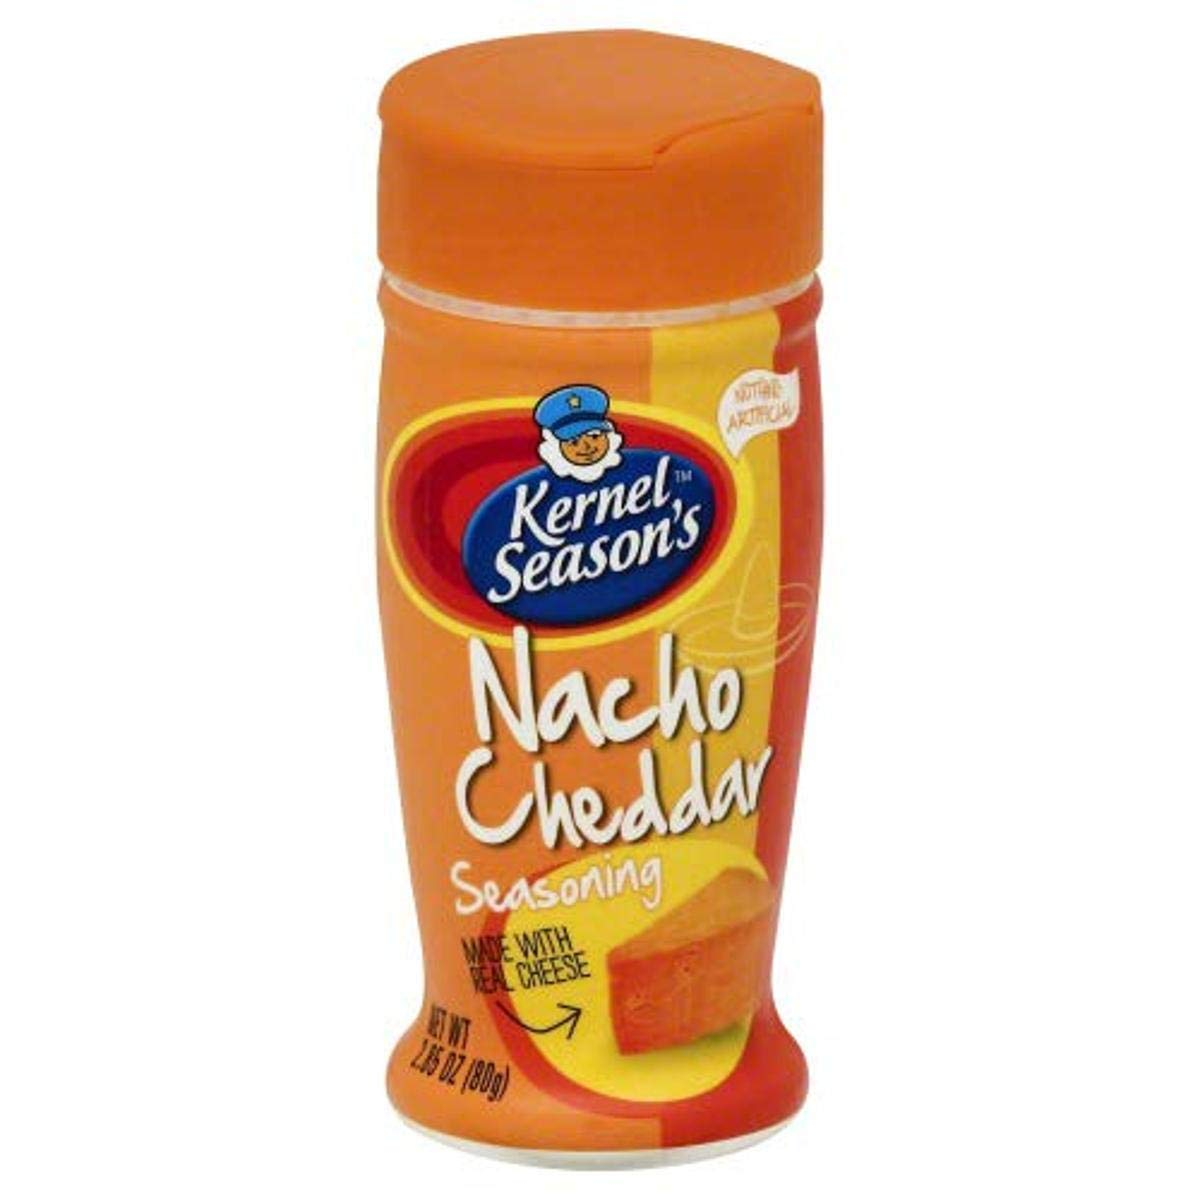 Kernel Season's Popcorn Seasoning, Nacho Cheddar, 2.85 oz